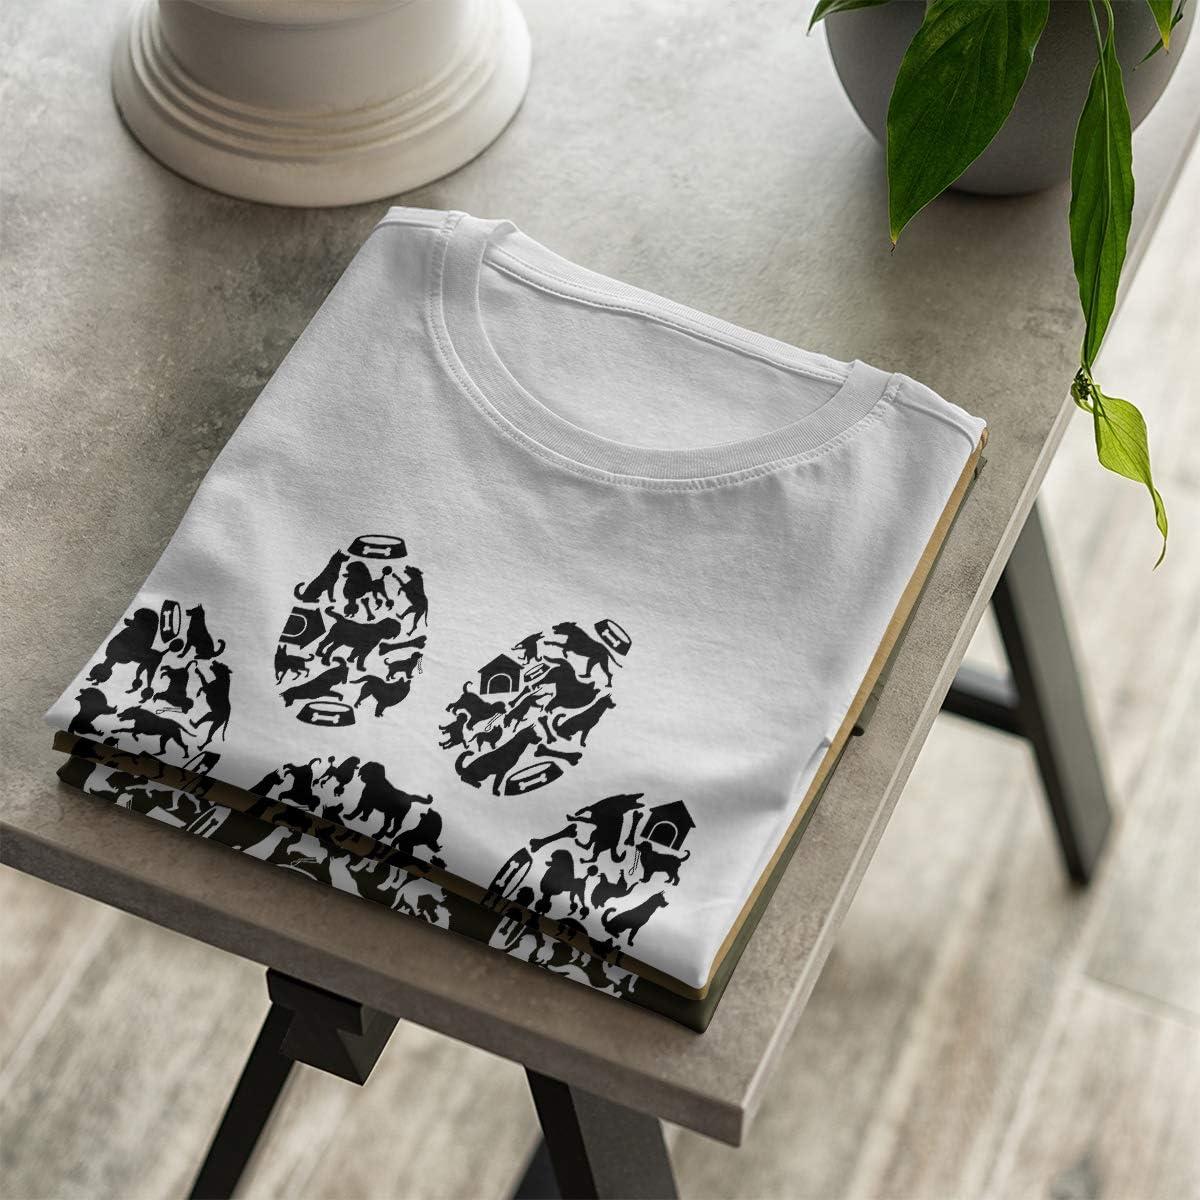 Hundepfote Verschiedene Hunde Rassen XXL S Damen OM3/® Dog Paws T-Shirt